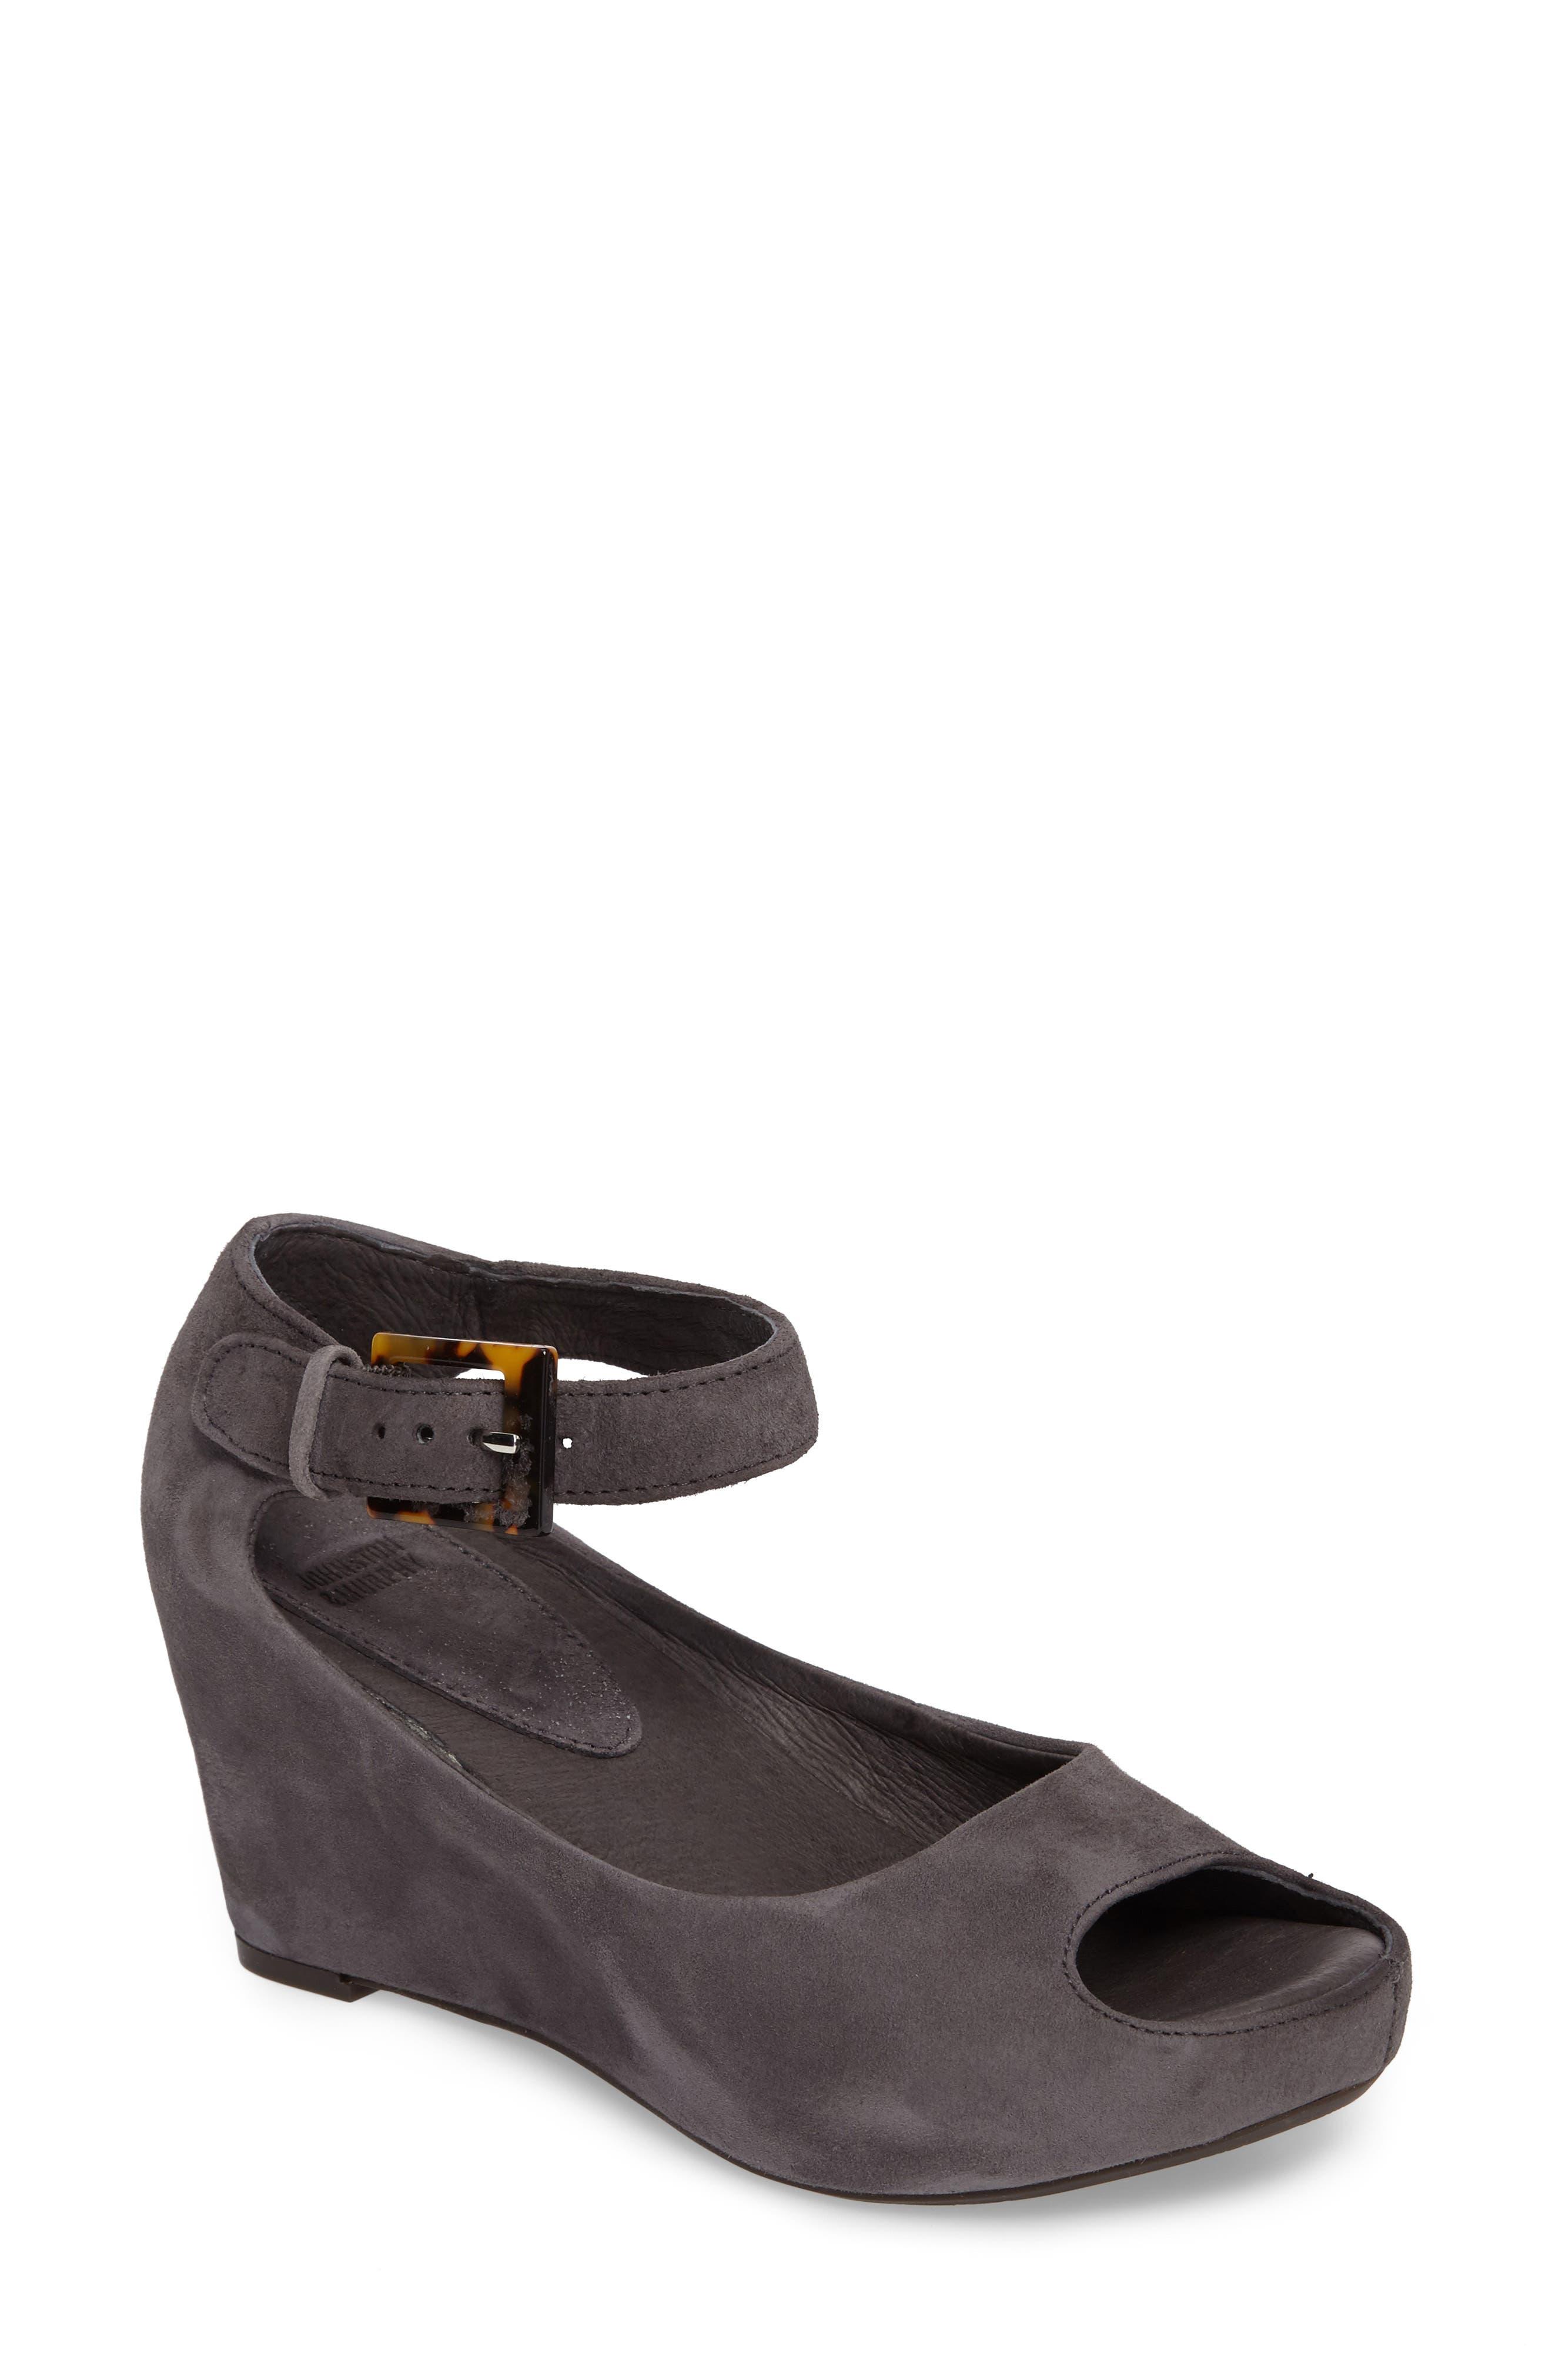 'Tricia' Ankle Strap Sandal,                         Main,                         color,